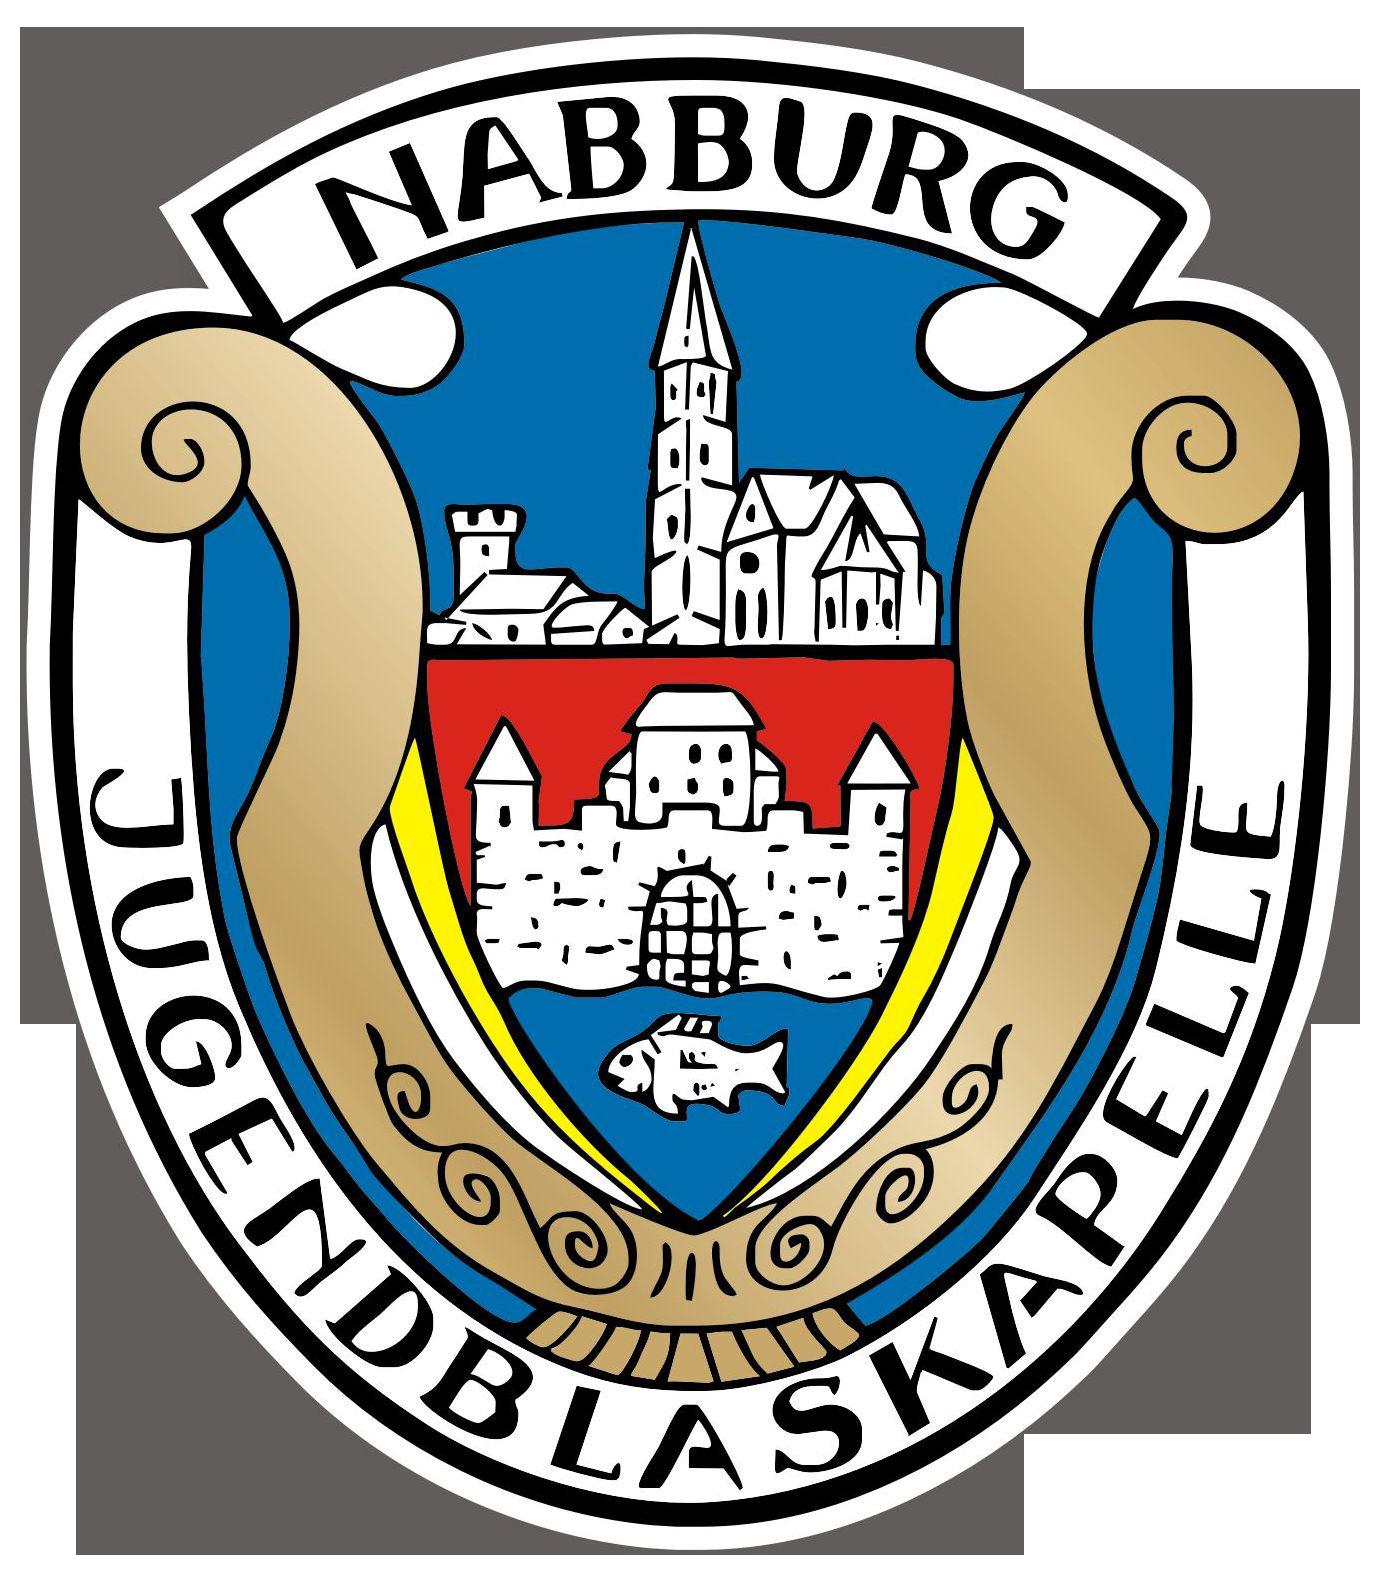 50 Jahre Jugendblaskapelle Nabburg - Jubiläumskonzert